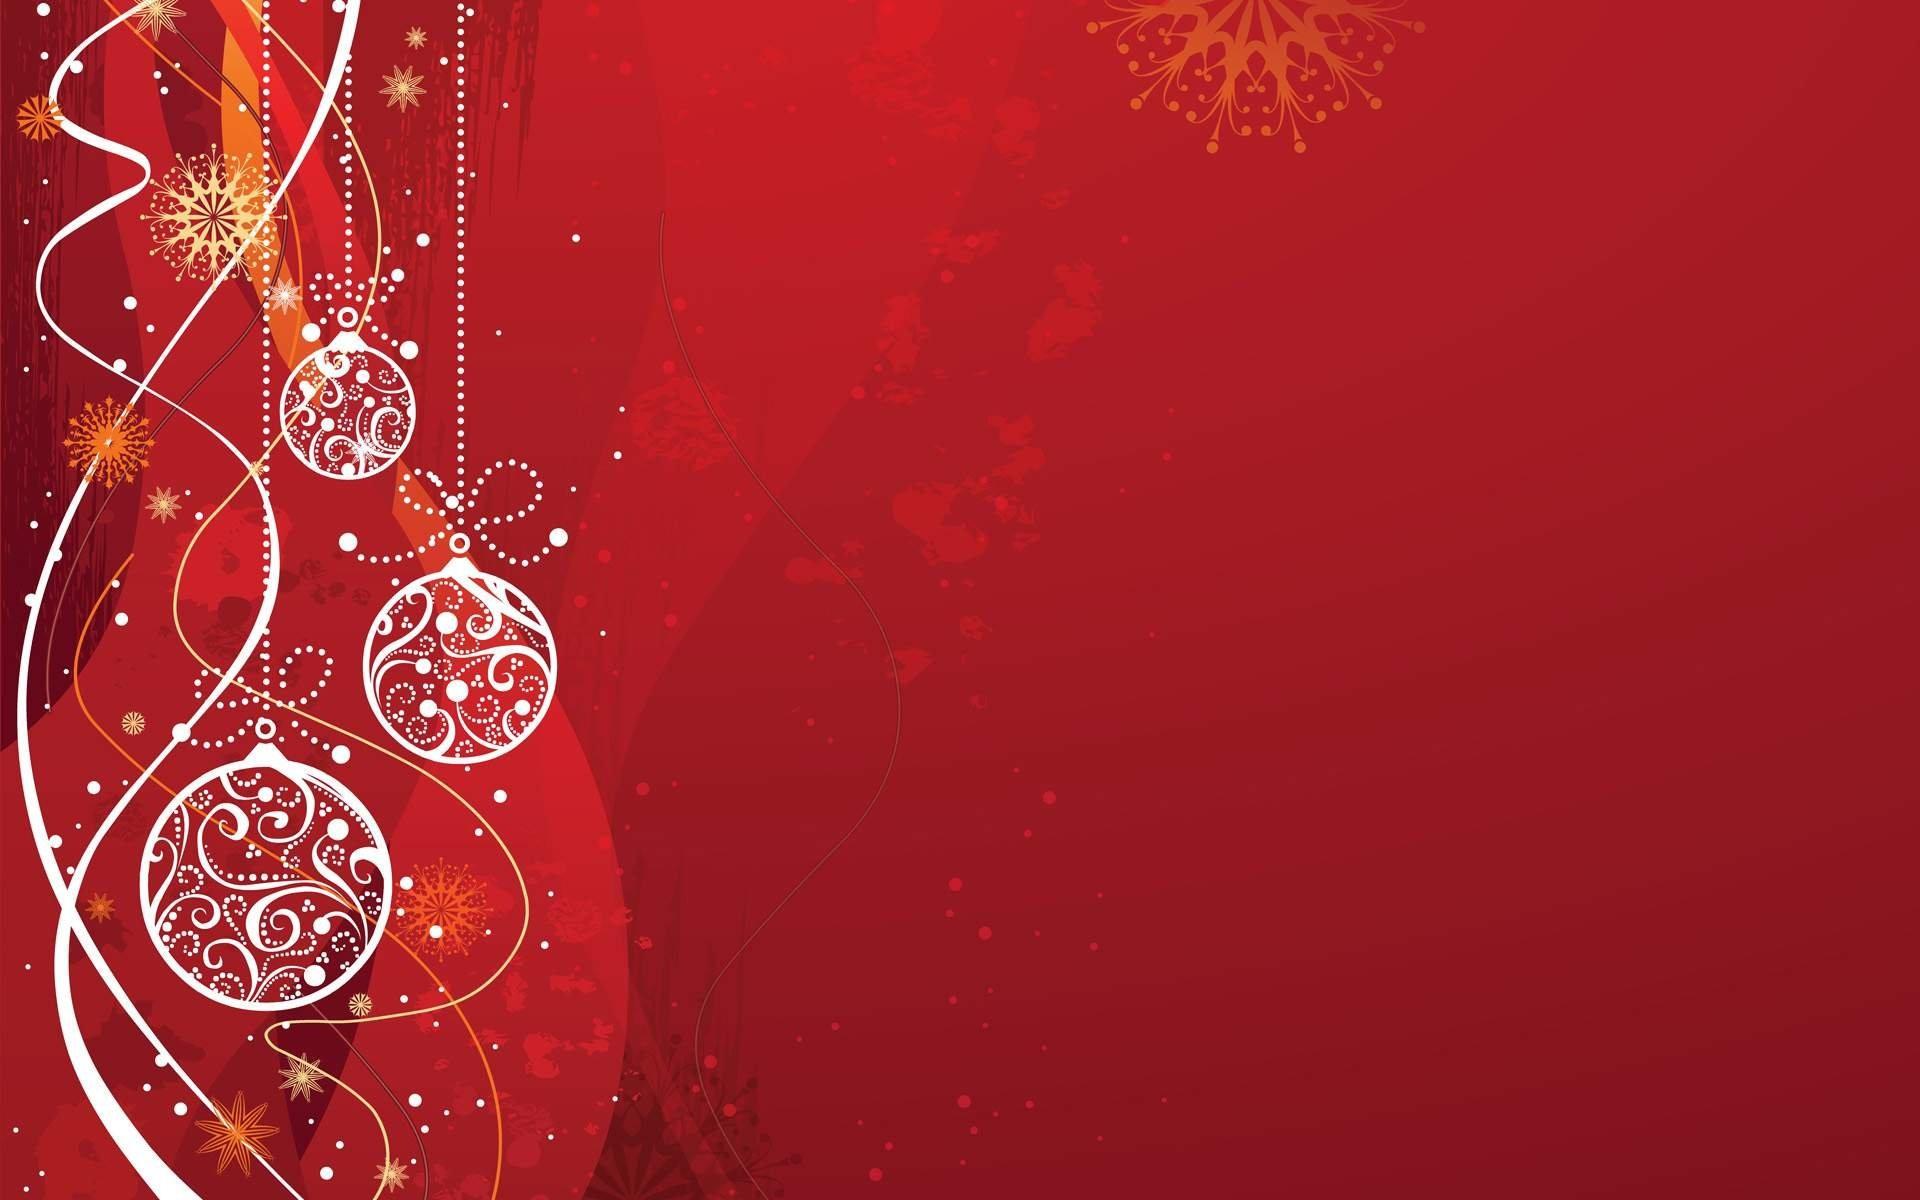 merry christmas background  u00b7 u2460 download free cool hd